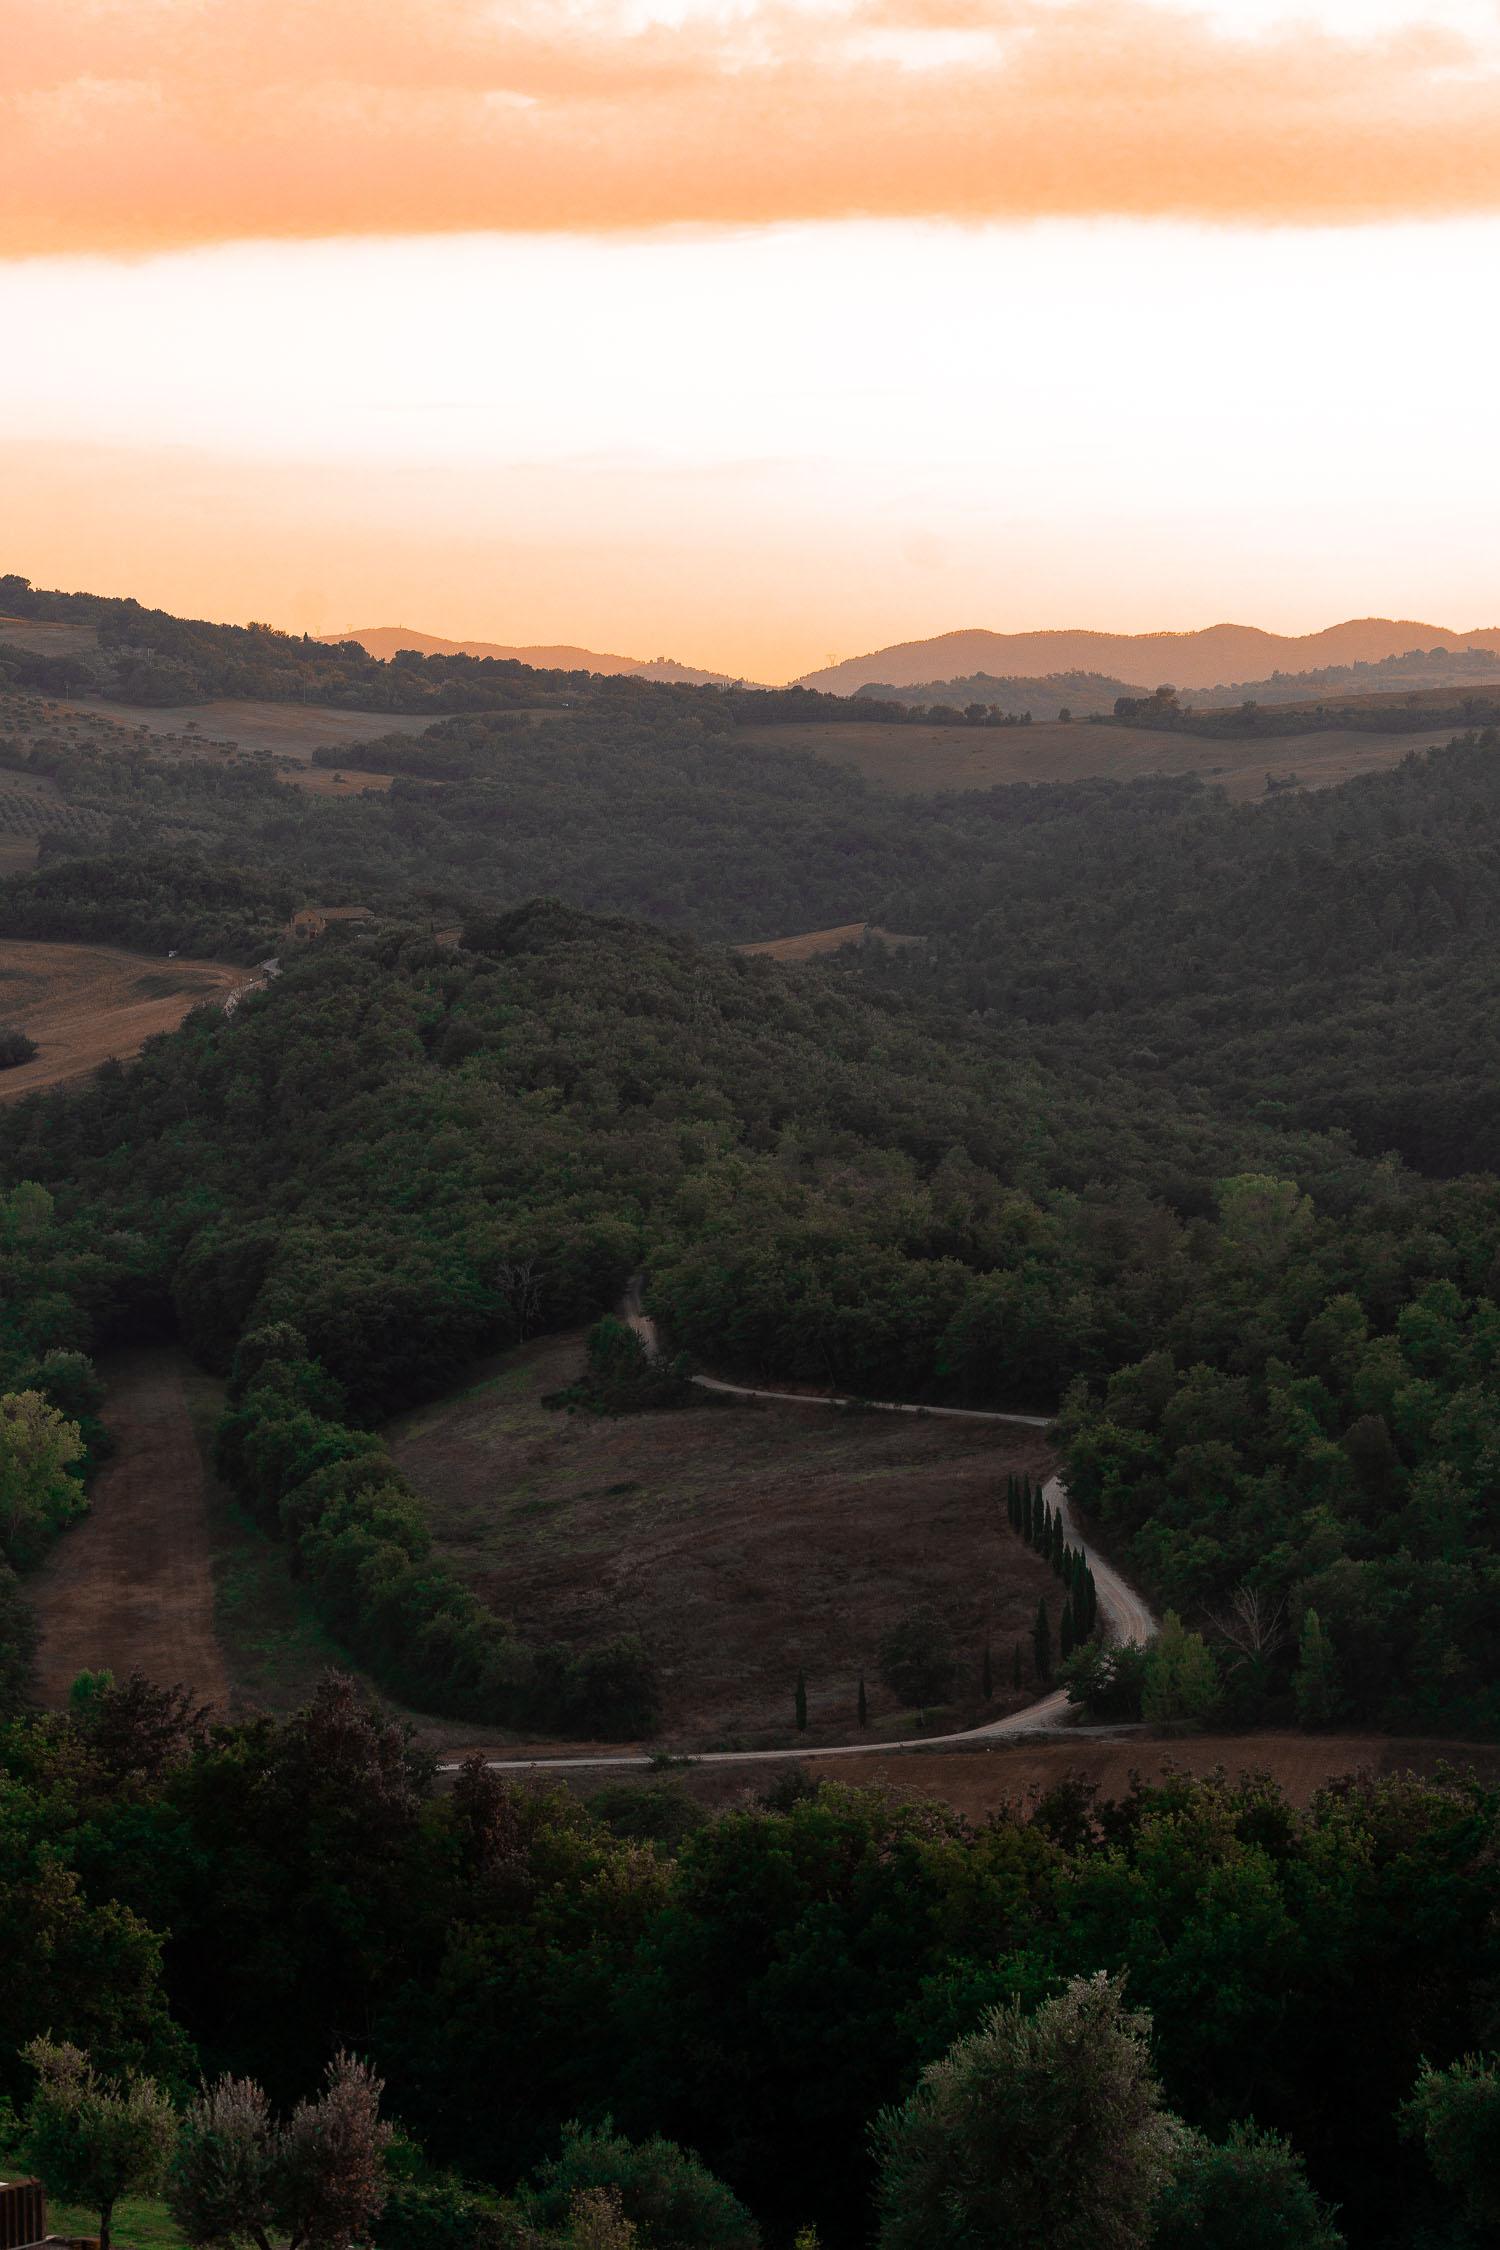 Tuscany-landscape-winding-road-01895.jpg